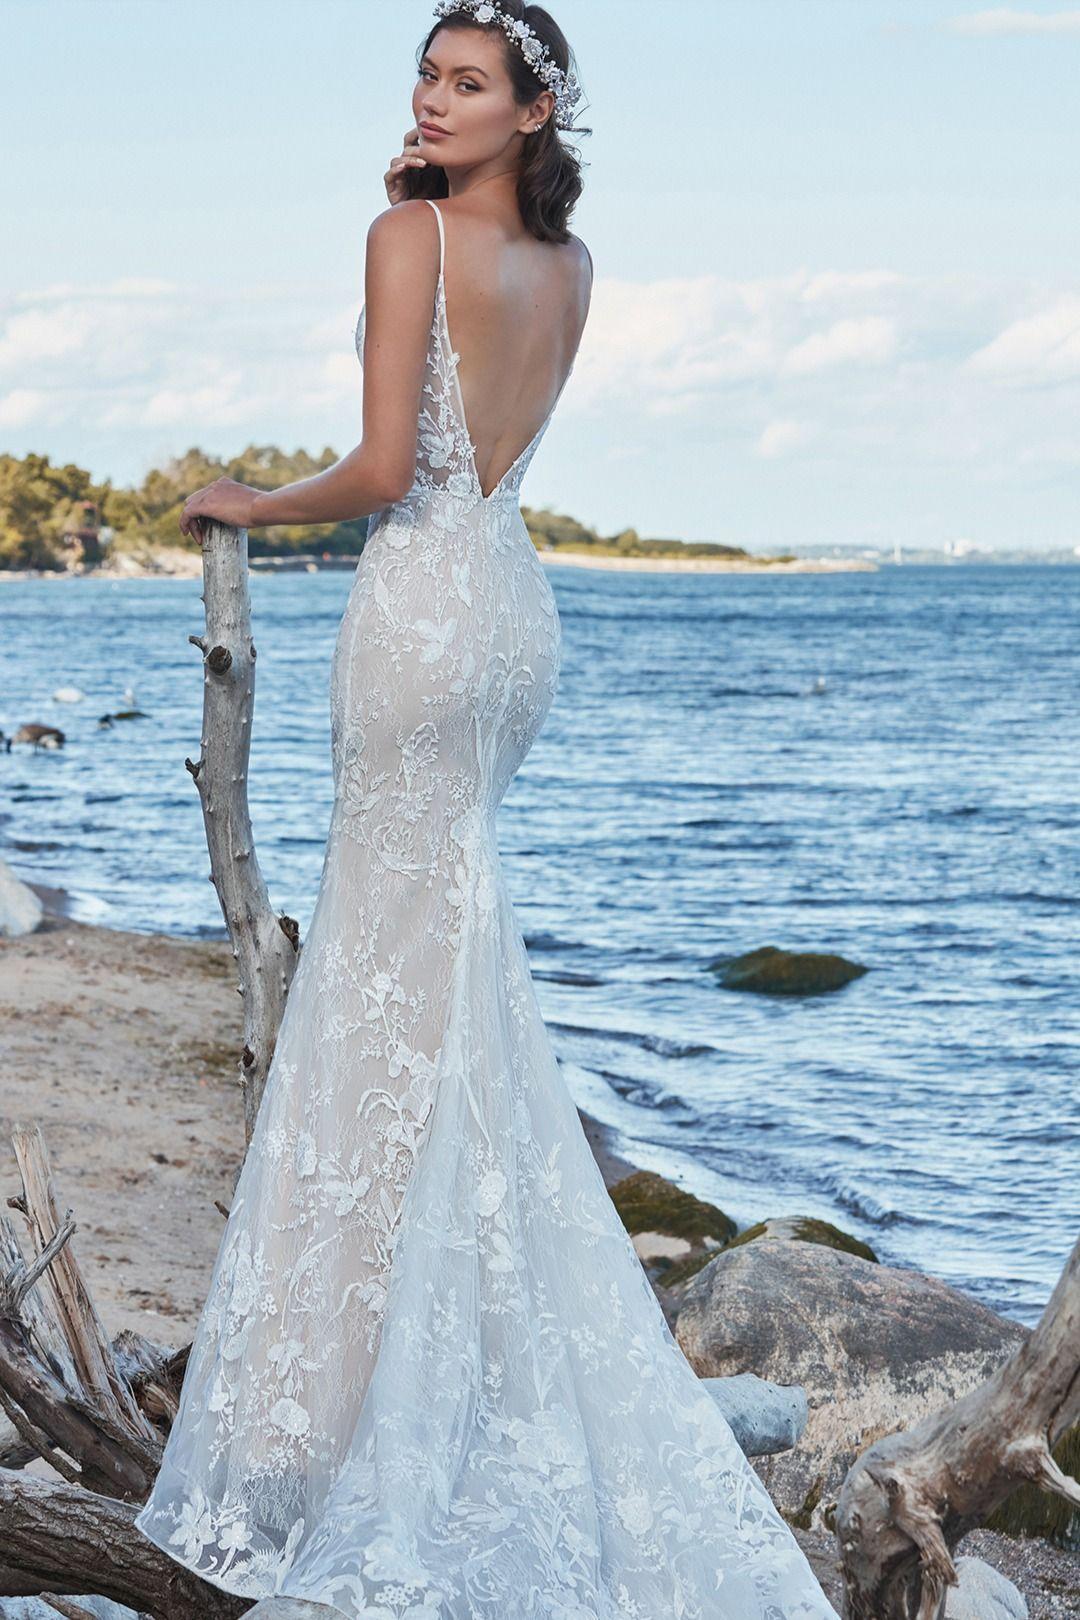 La21106 Analisa Wedding Dresses Backless Wedding Dress Wedding Dresses Lace [ 1620 x 1080 Pixel ]